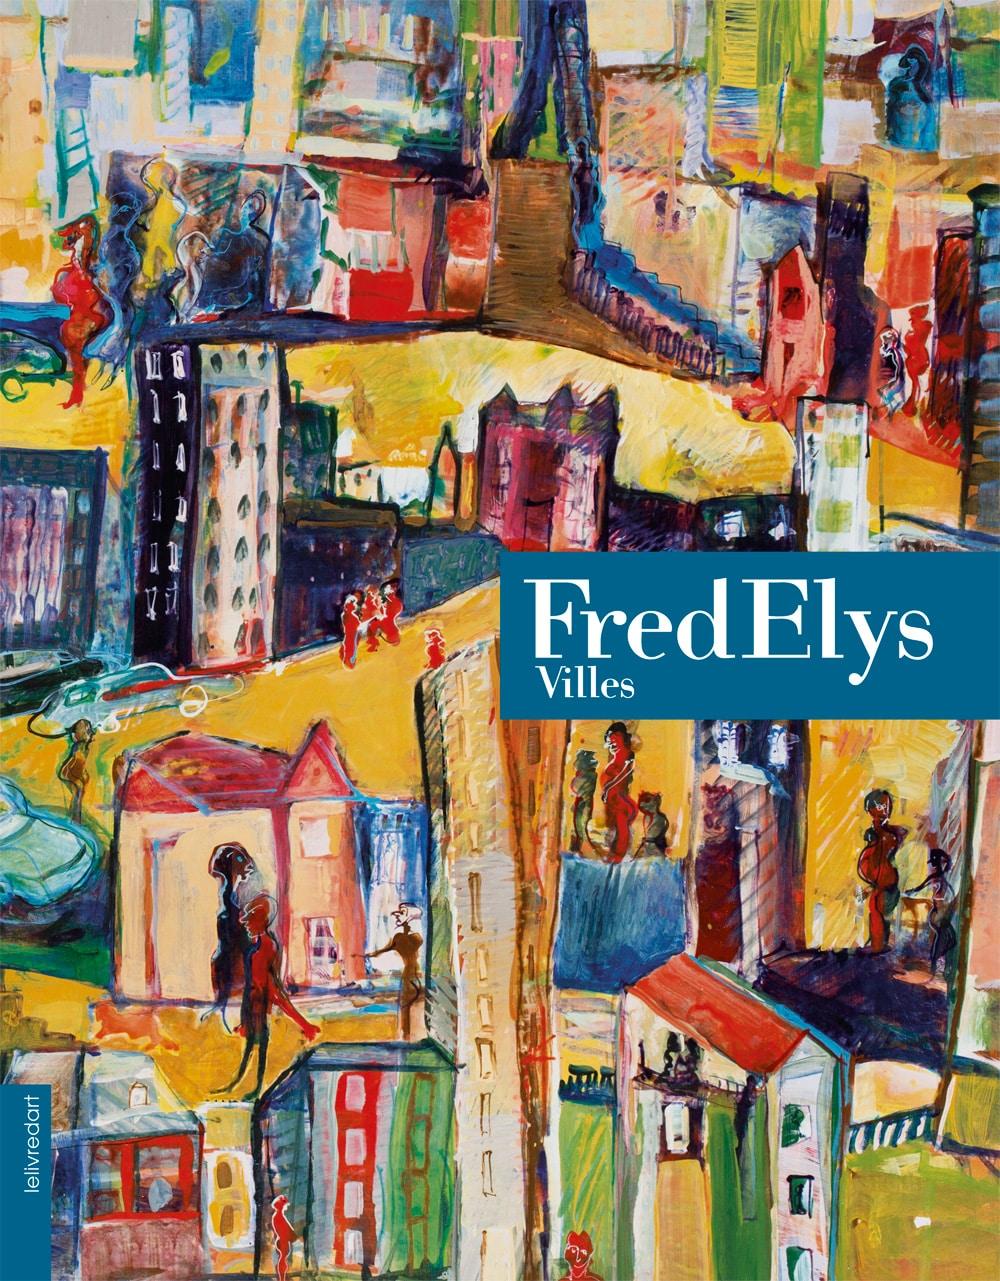 FredElys – Villes